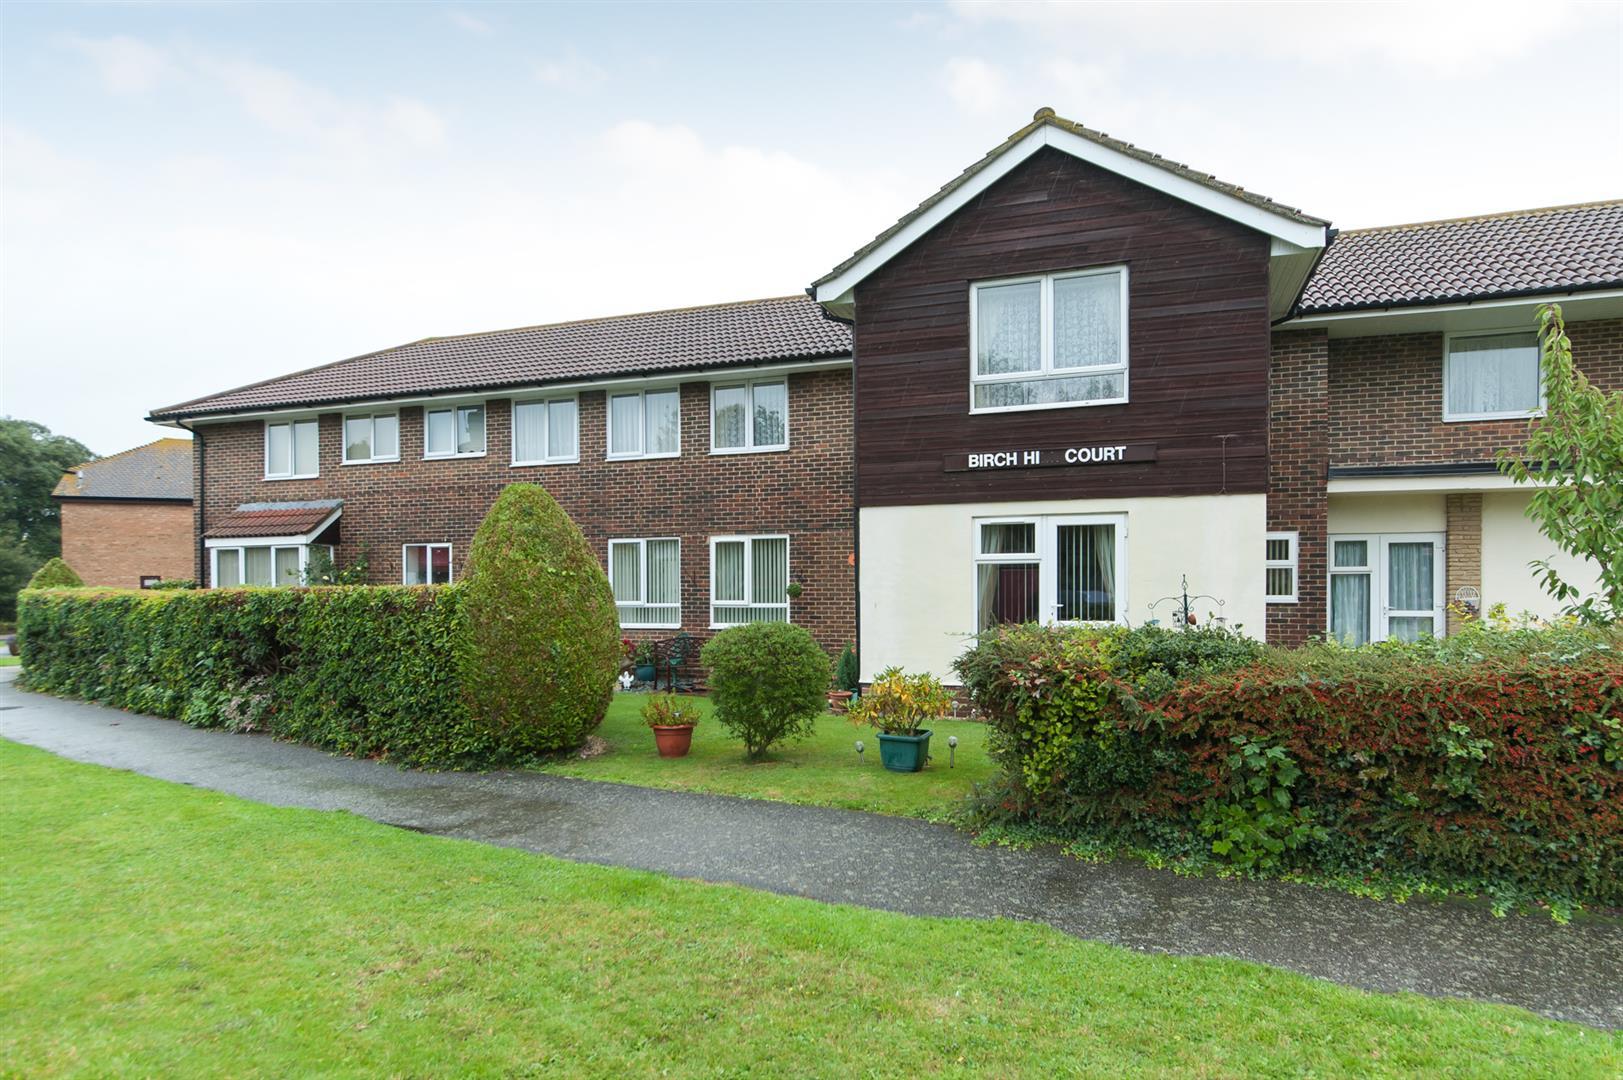 2 Bedrooms Flat for sale in Birch Hill Court, Birchington